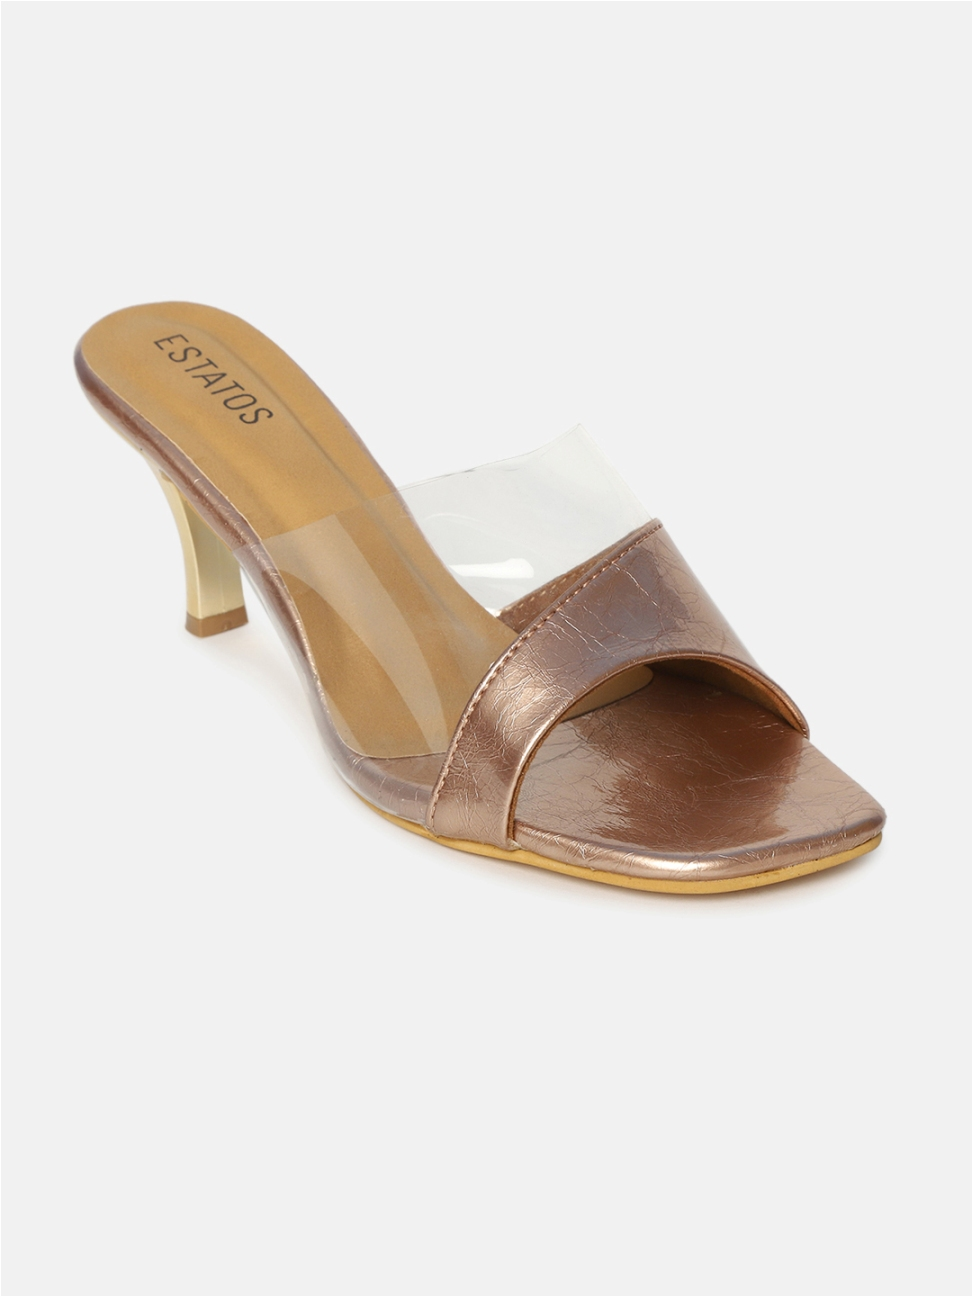 ESTATOS | Estatos Synthetic Leather Pointed Heeled Sandals